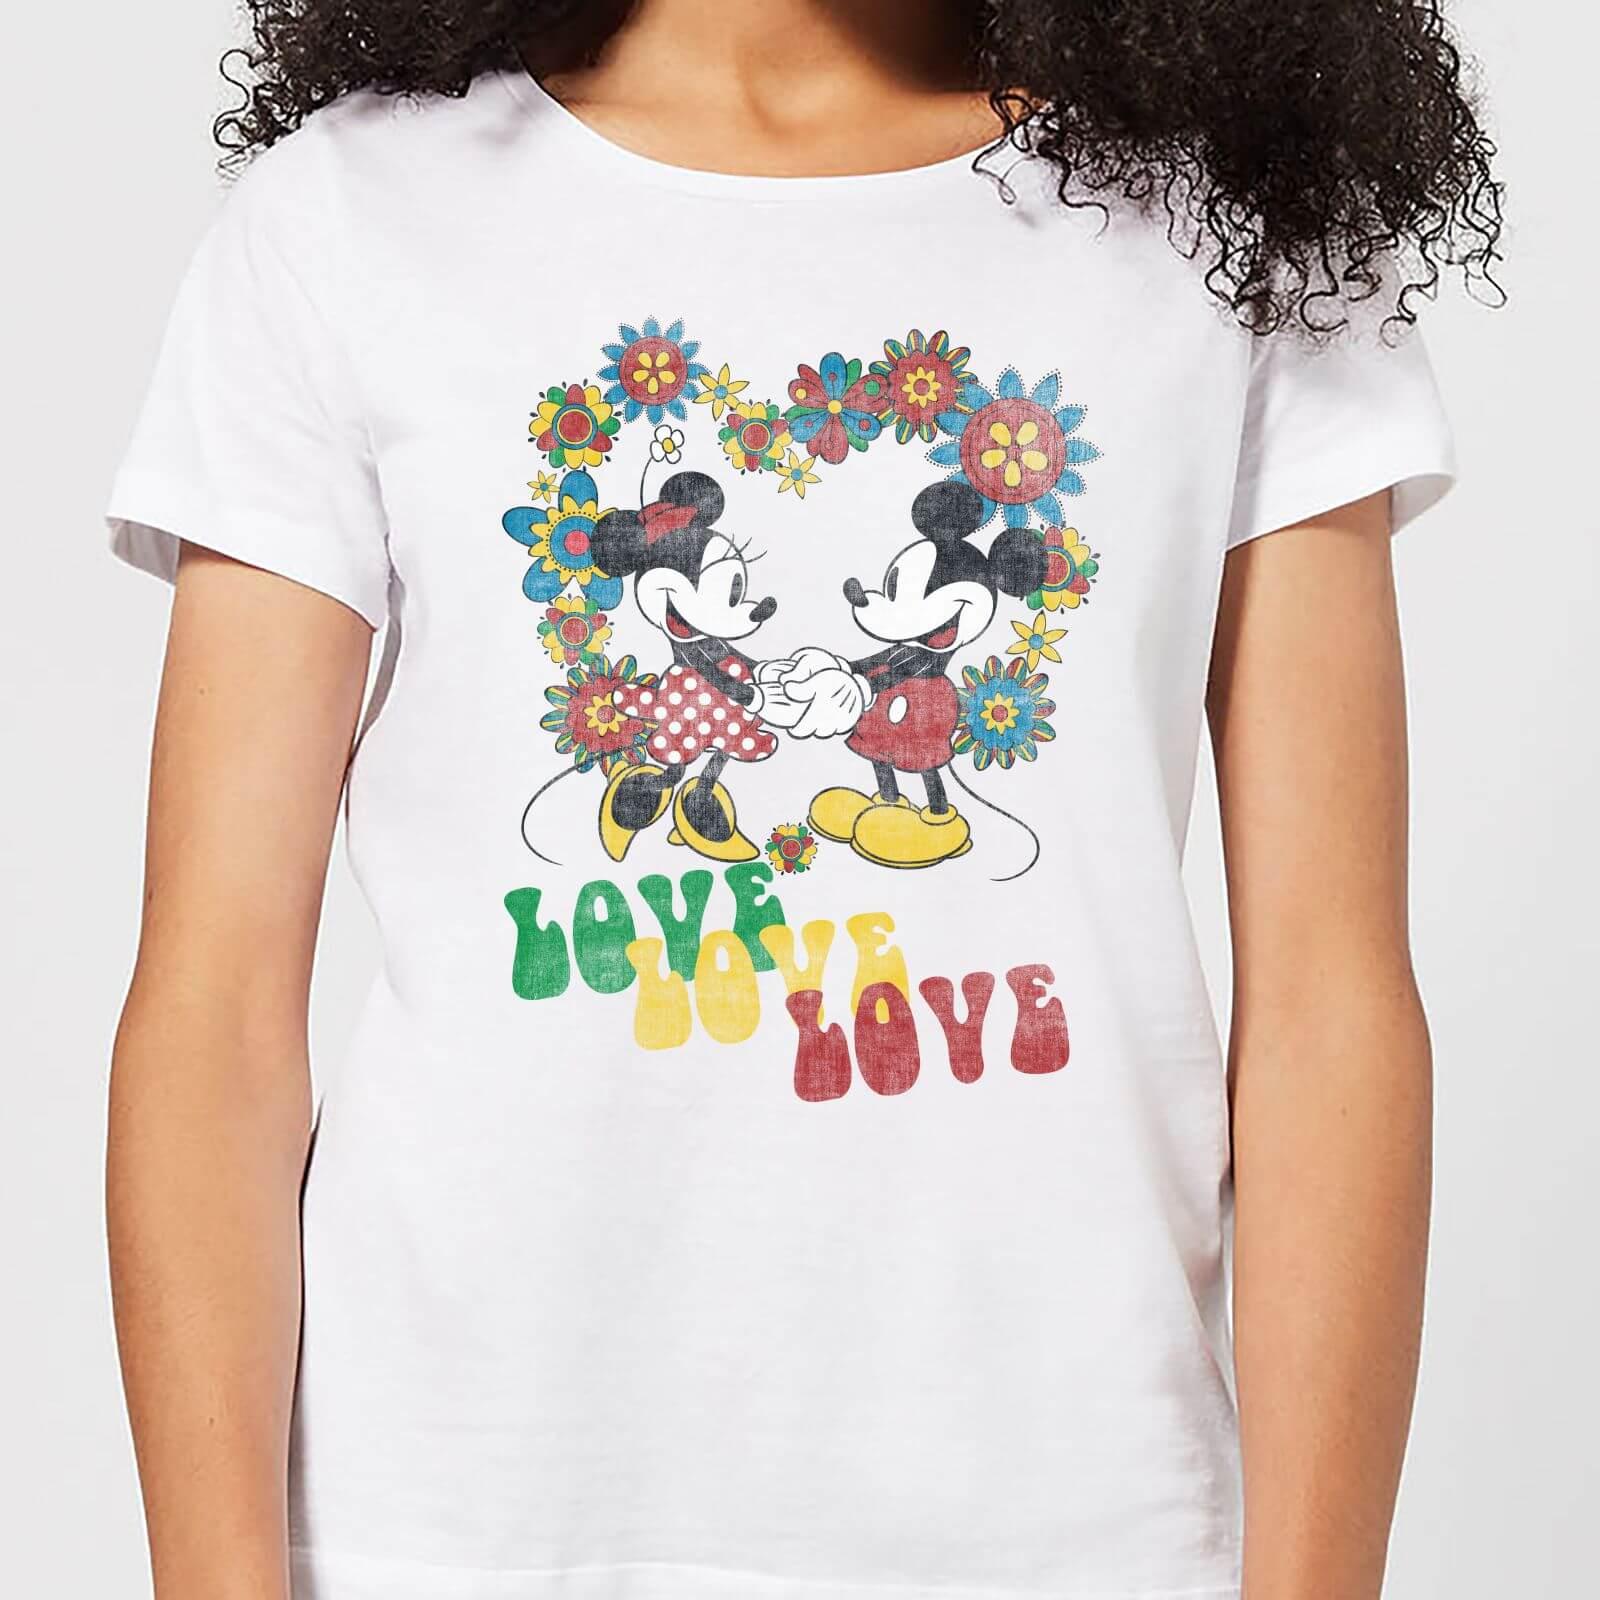 Disney Mickey Mouse Hippie Love Women's T-Shirt - White - XL - White